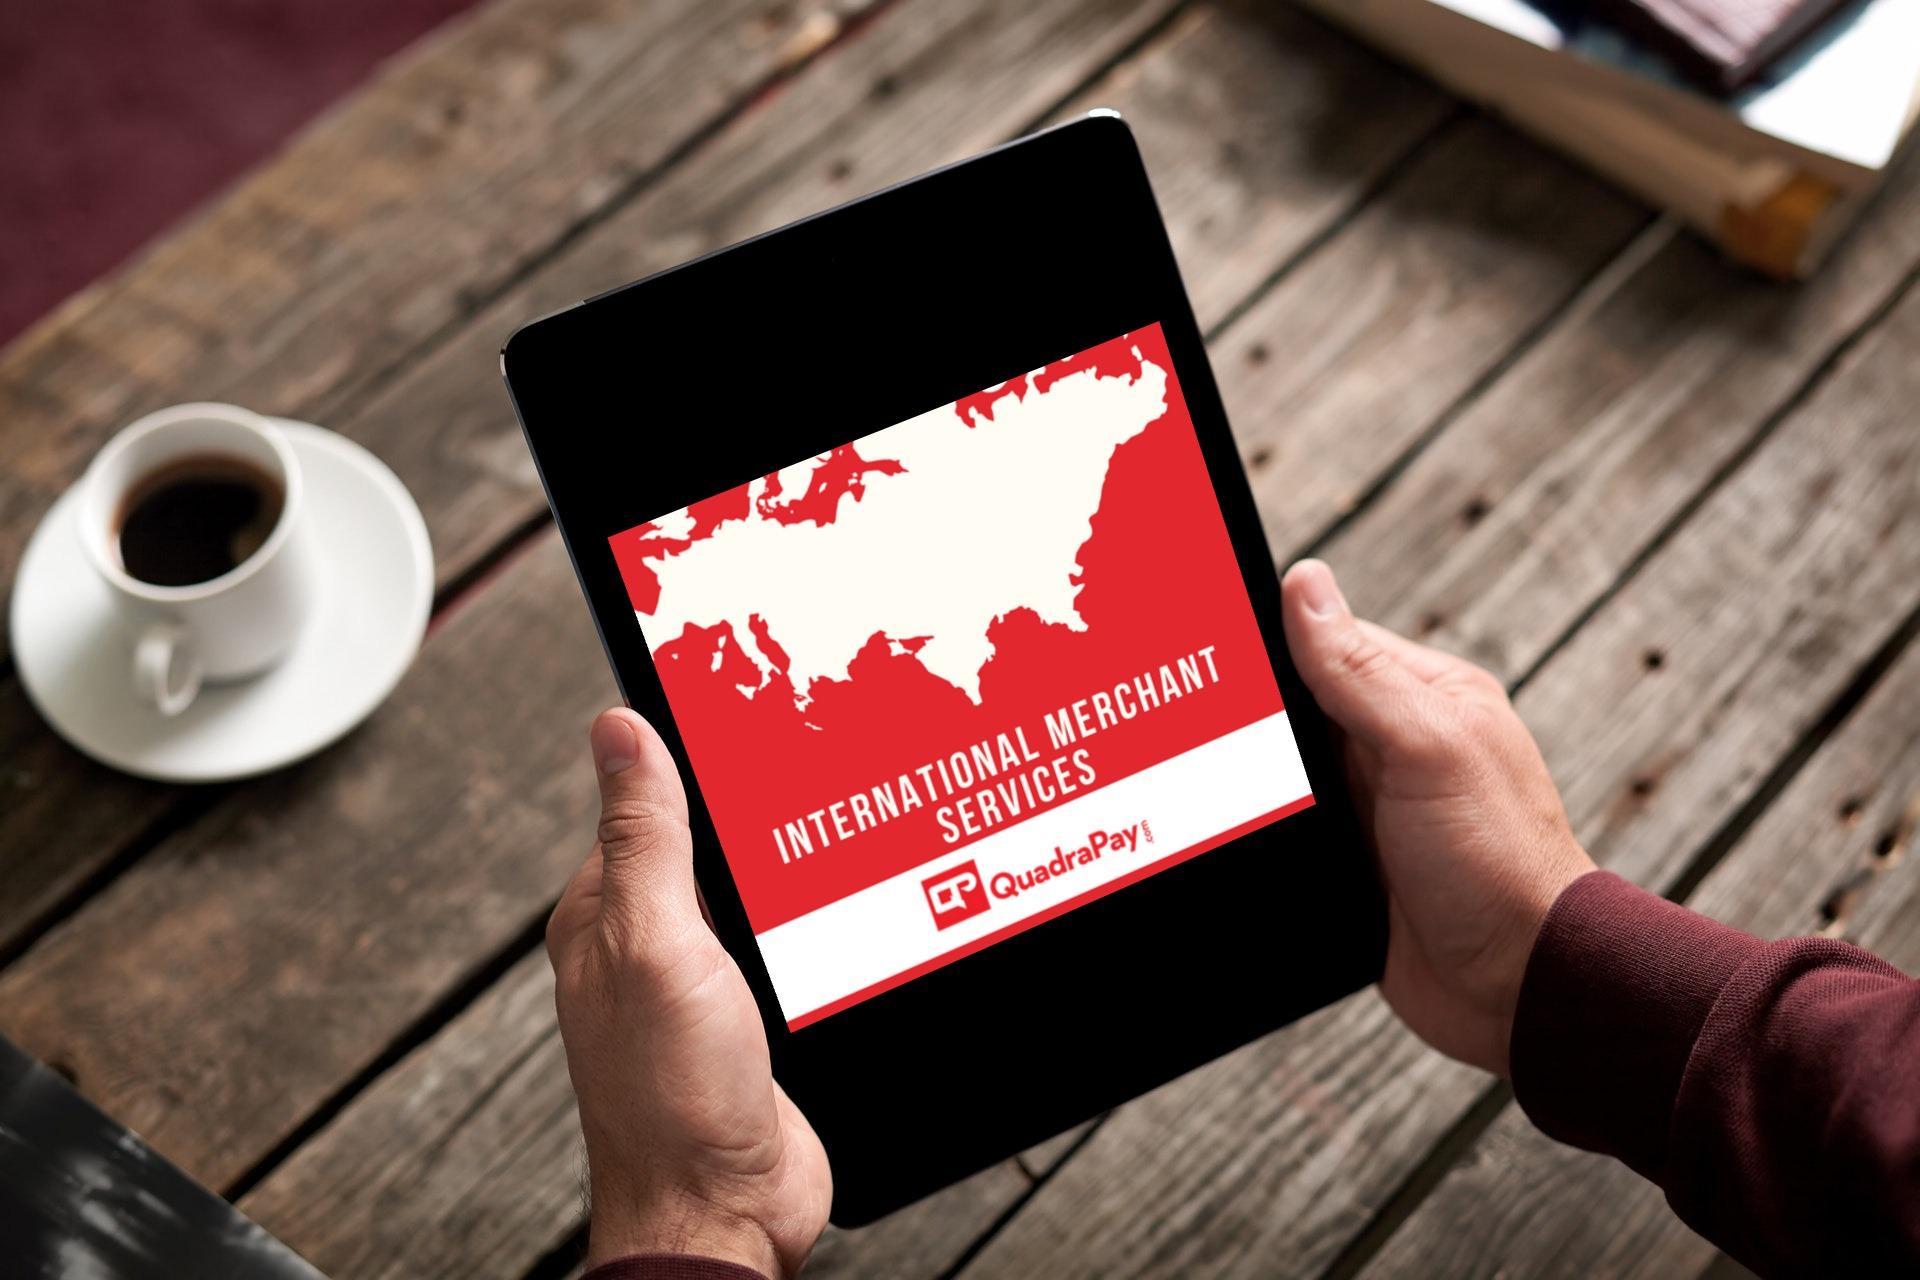 International Merchant Services by Quadrapay